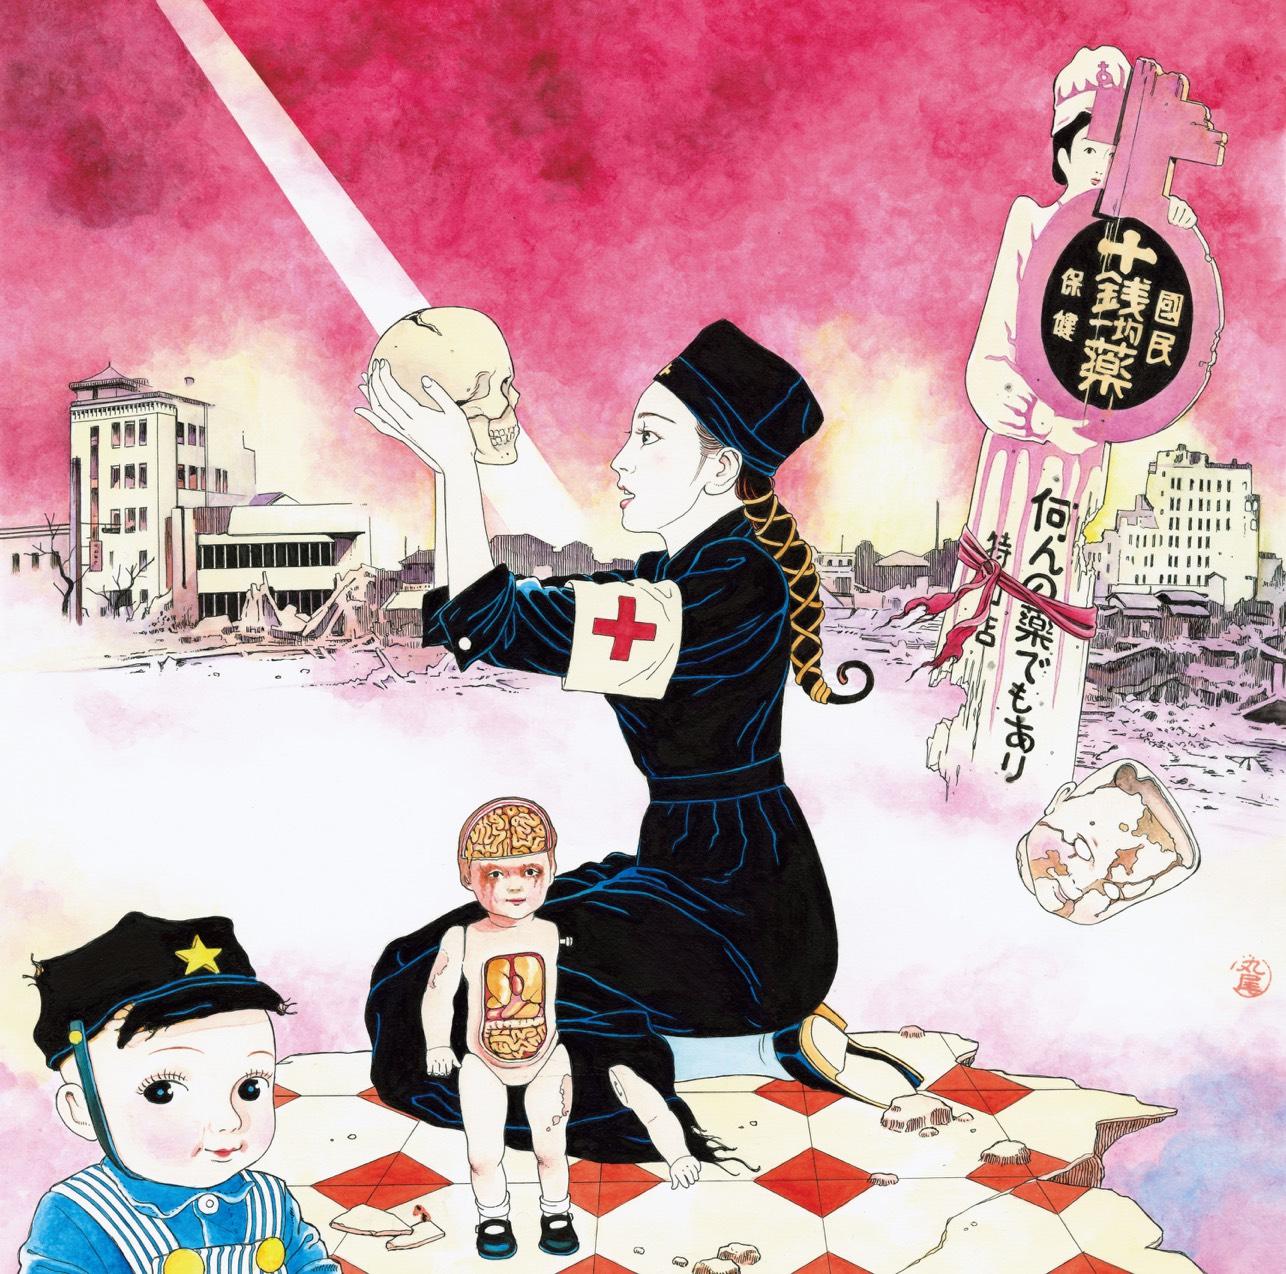 RMMS-URBANGARDE-Ai-to-Gensou-no-URBANGARDE-Reg-Suehiro-Maruo